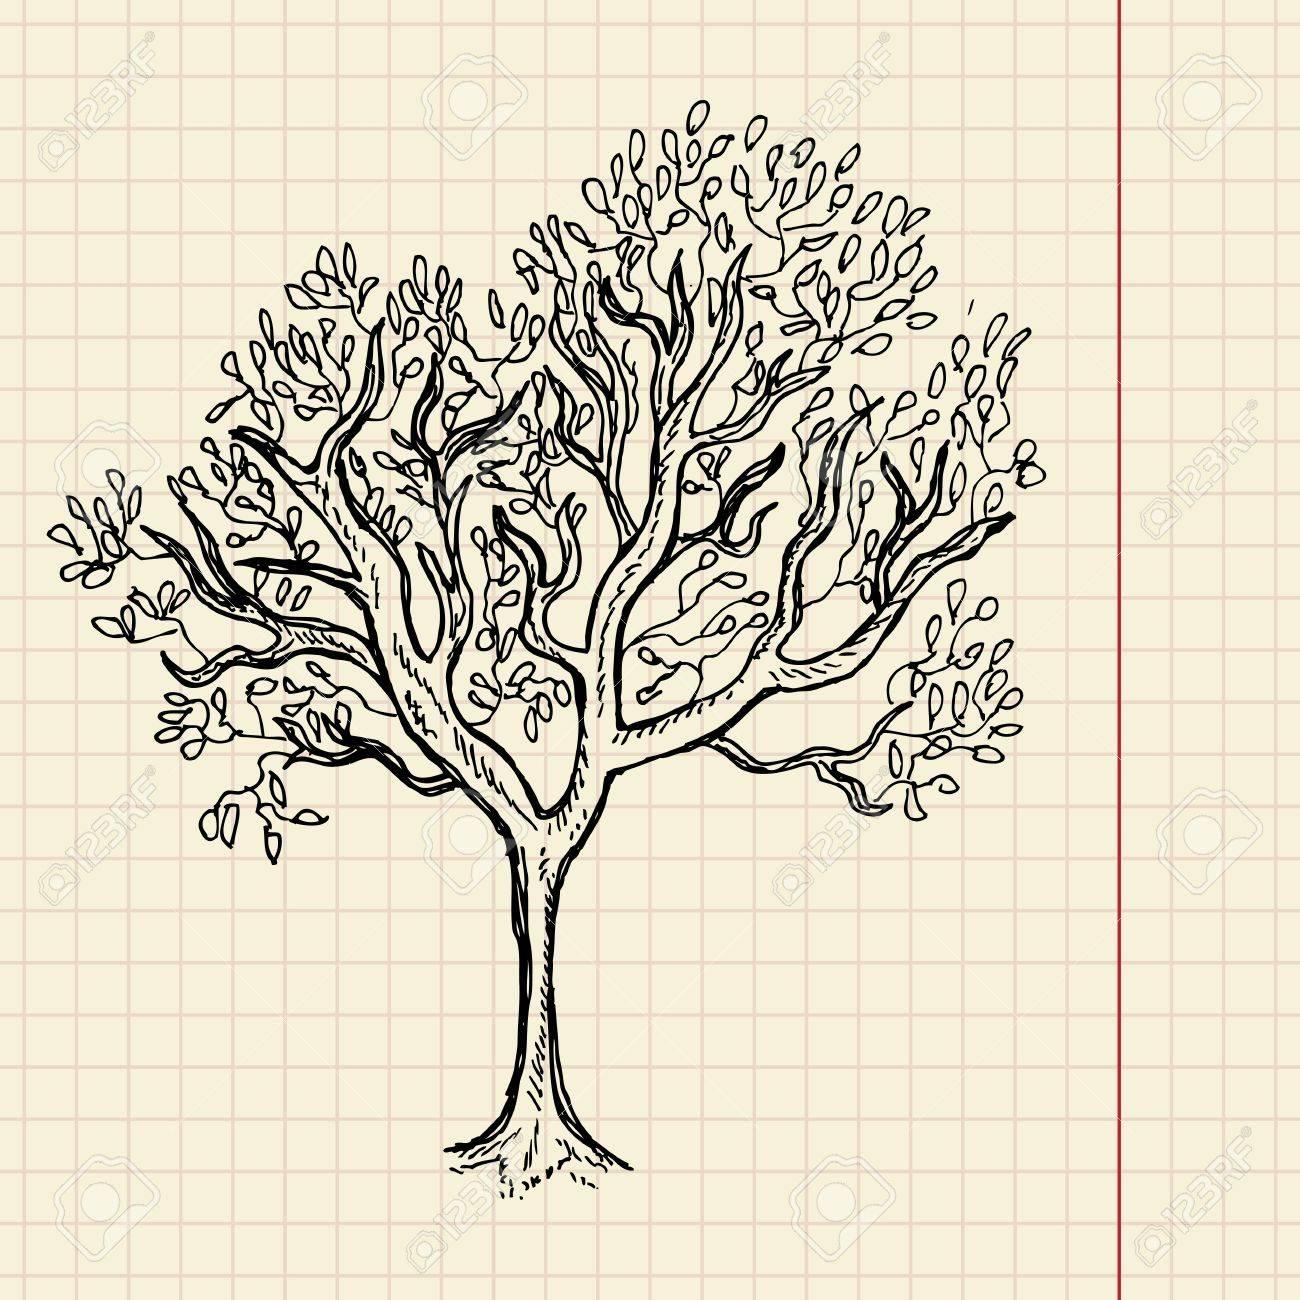 Bush sketch on school paper, vector illustration, eps 10 Stock Vector - 11377805